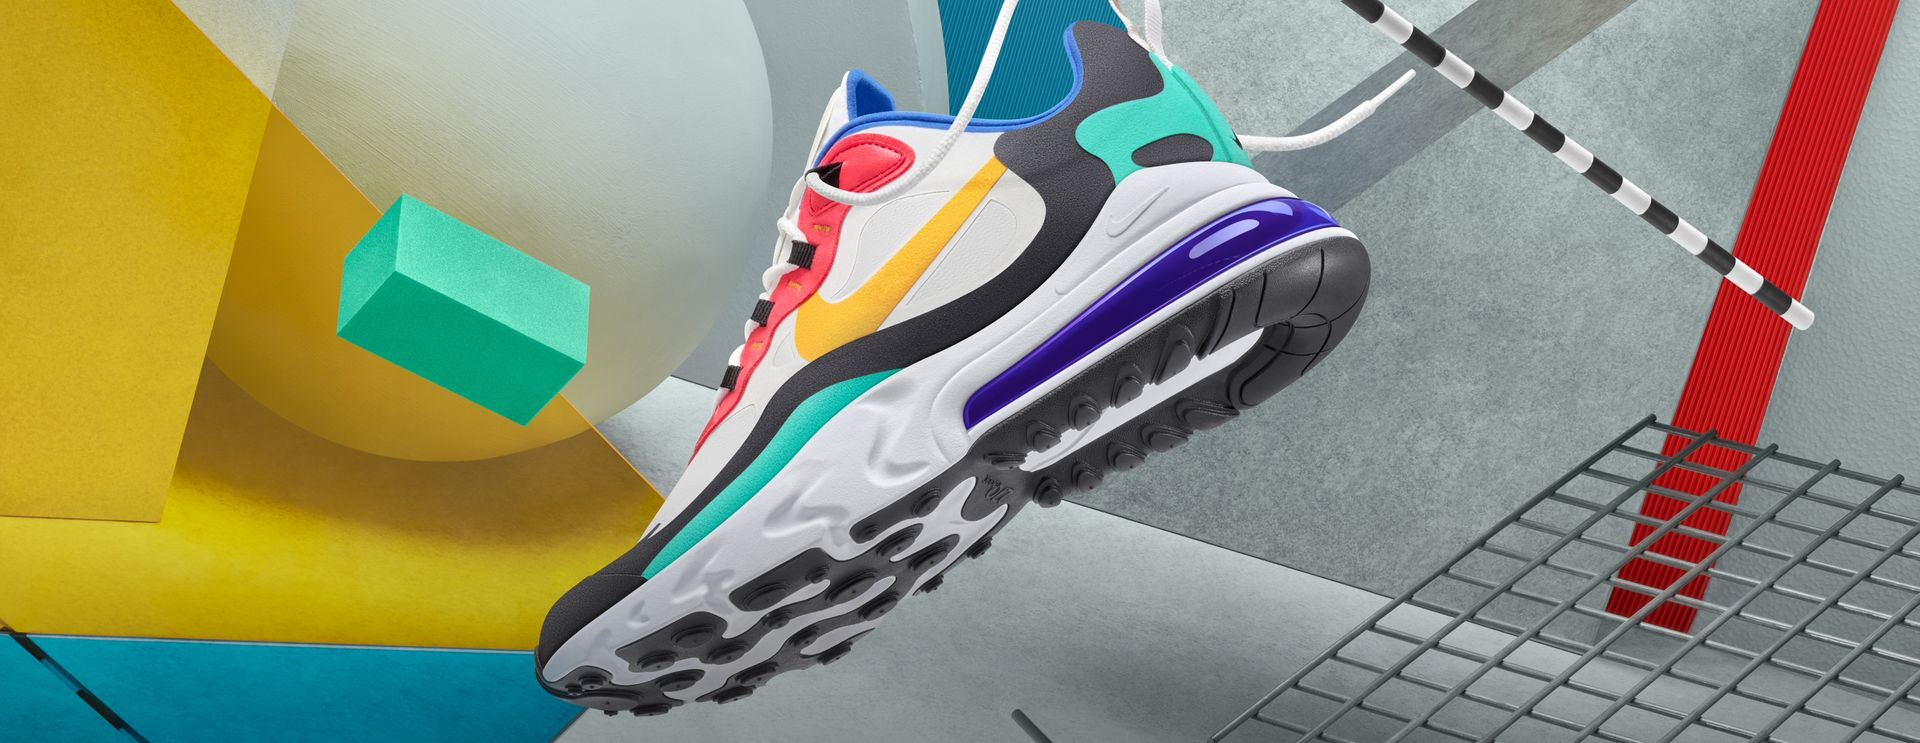 Nike  Just Do It  Nike com FI